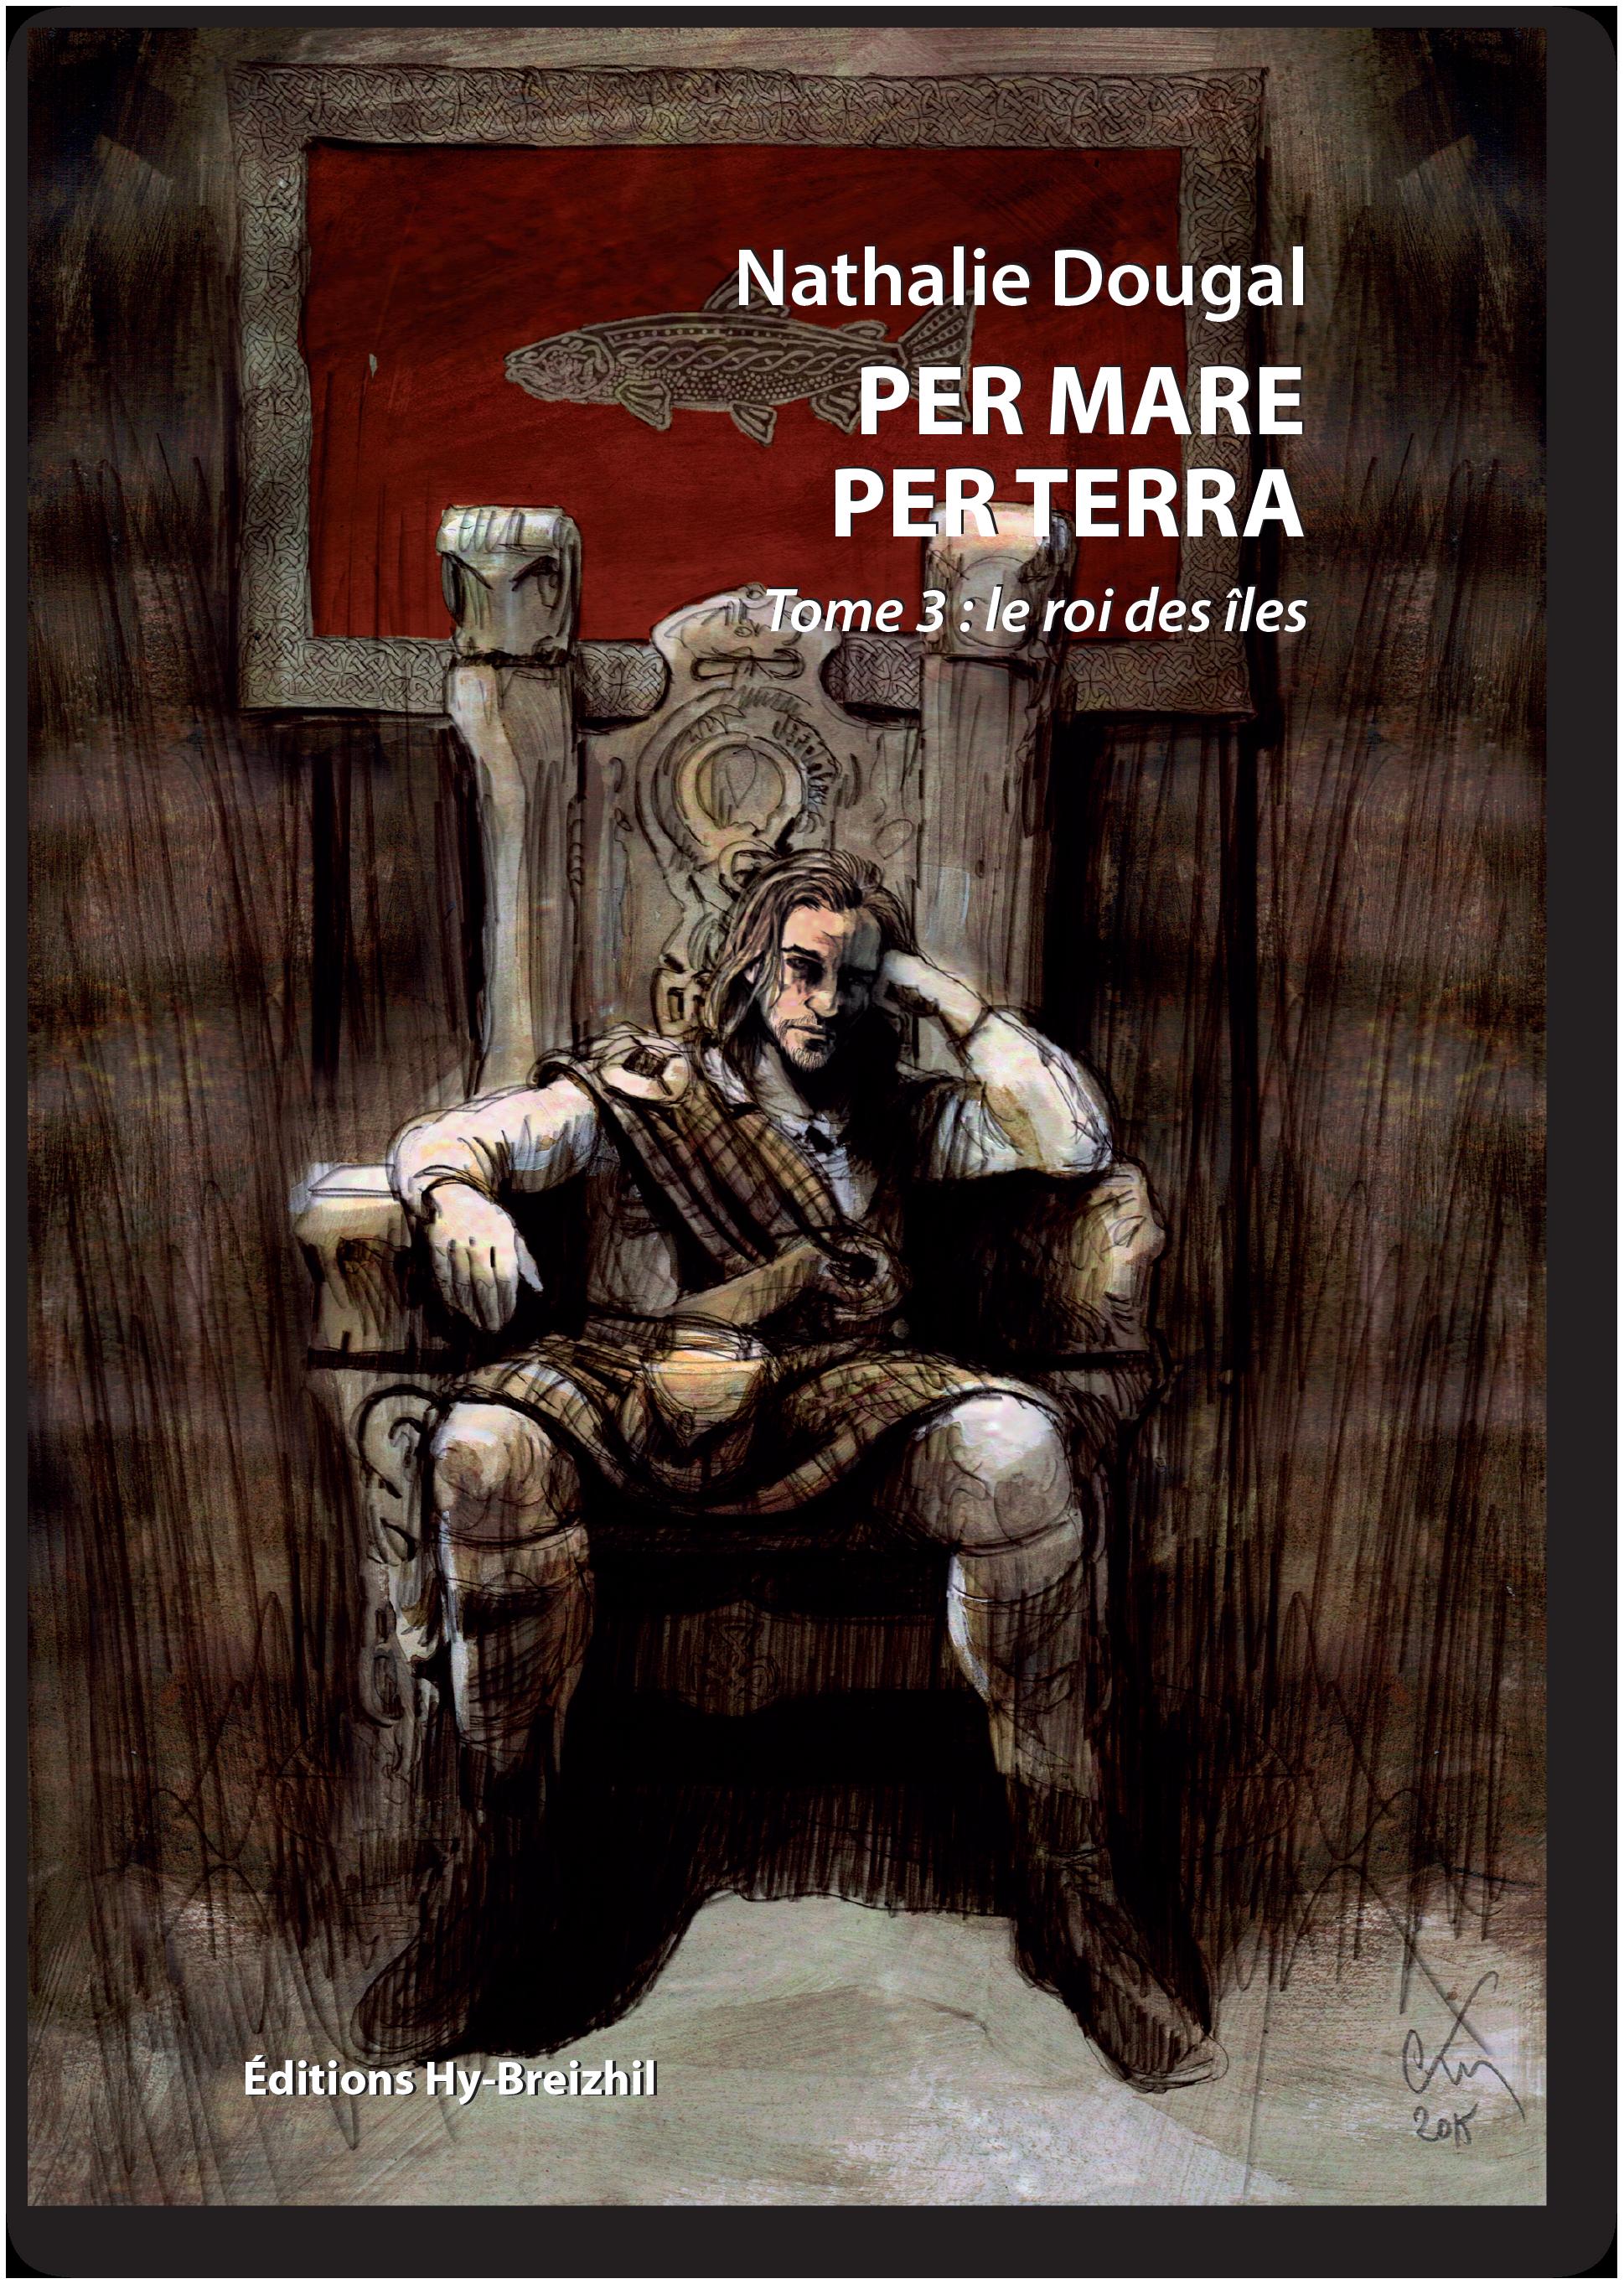 Per Mare Per Terra - Tome 3 : Le roi des îles / Nathalie Dougal - Format broché